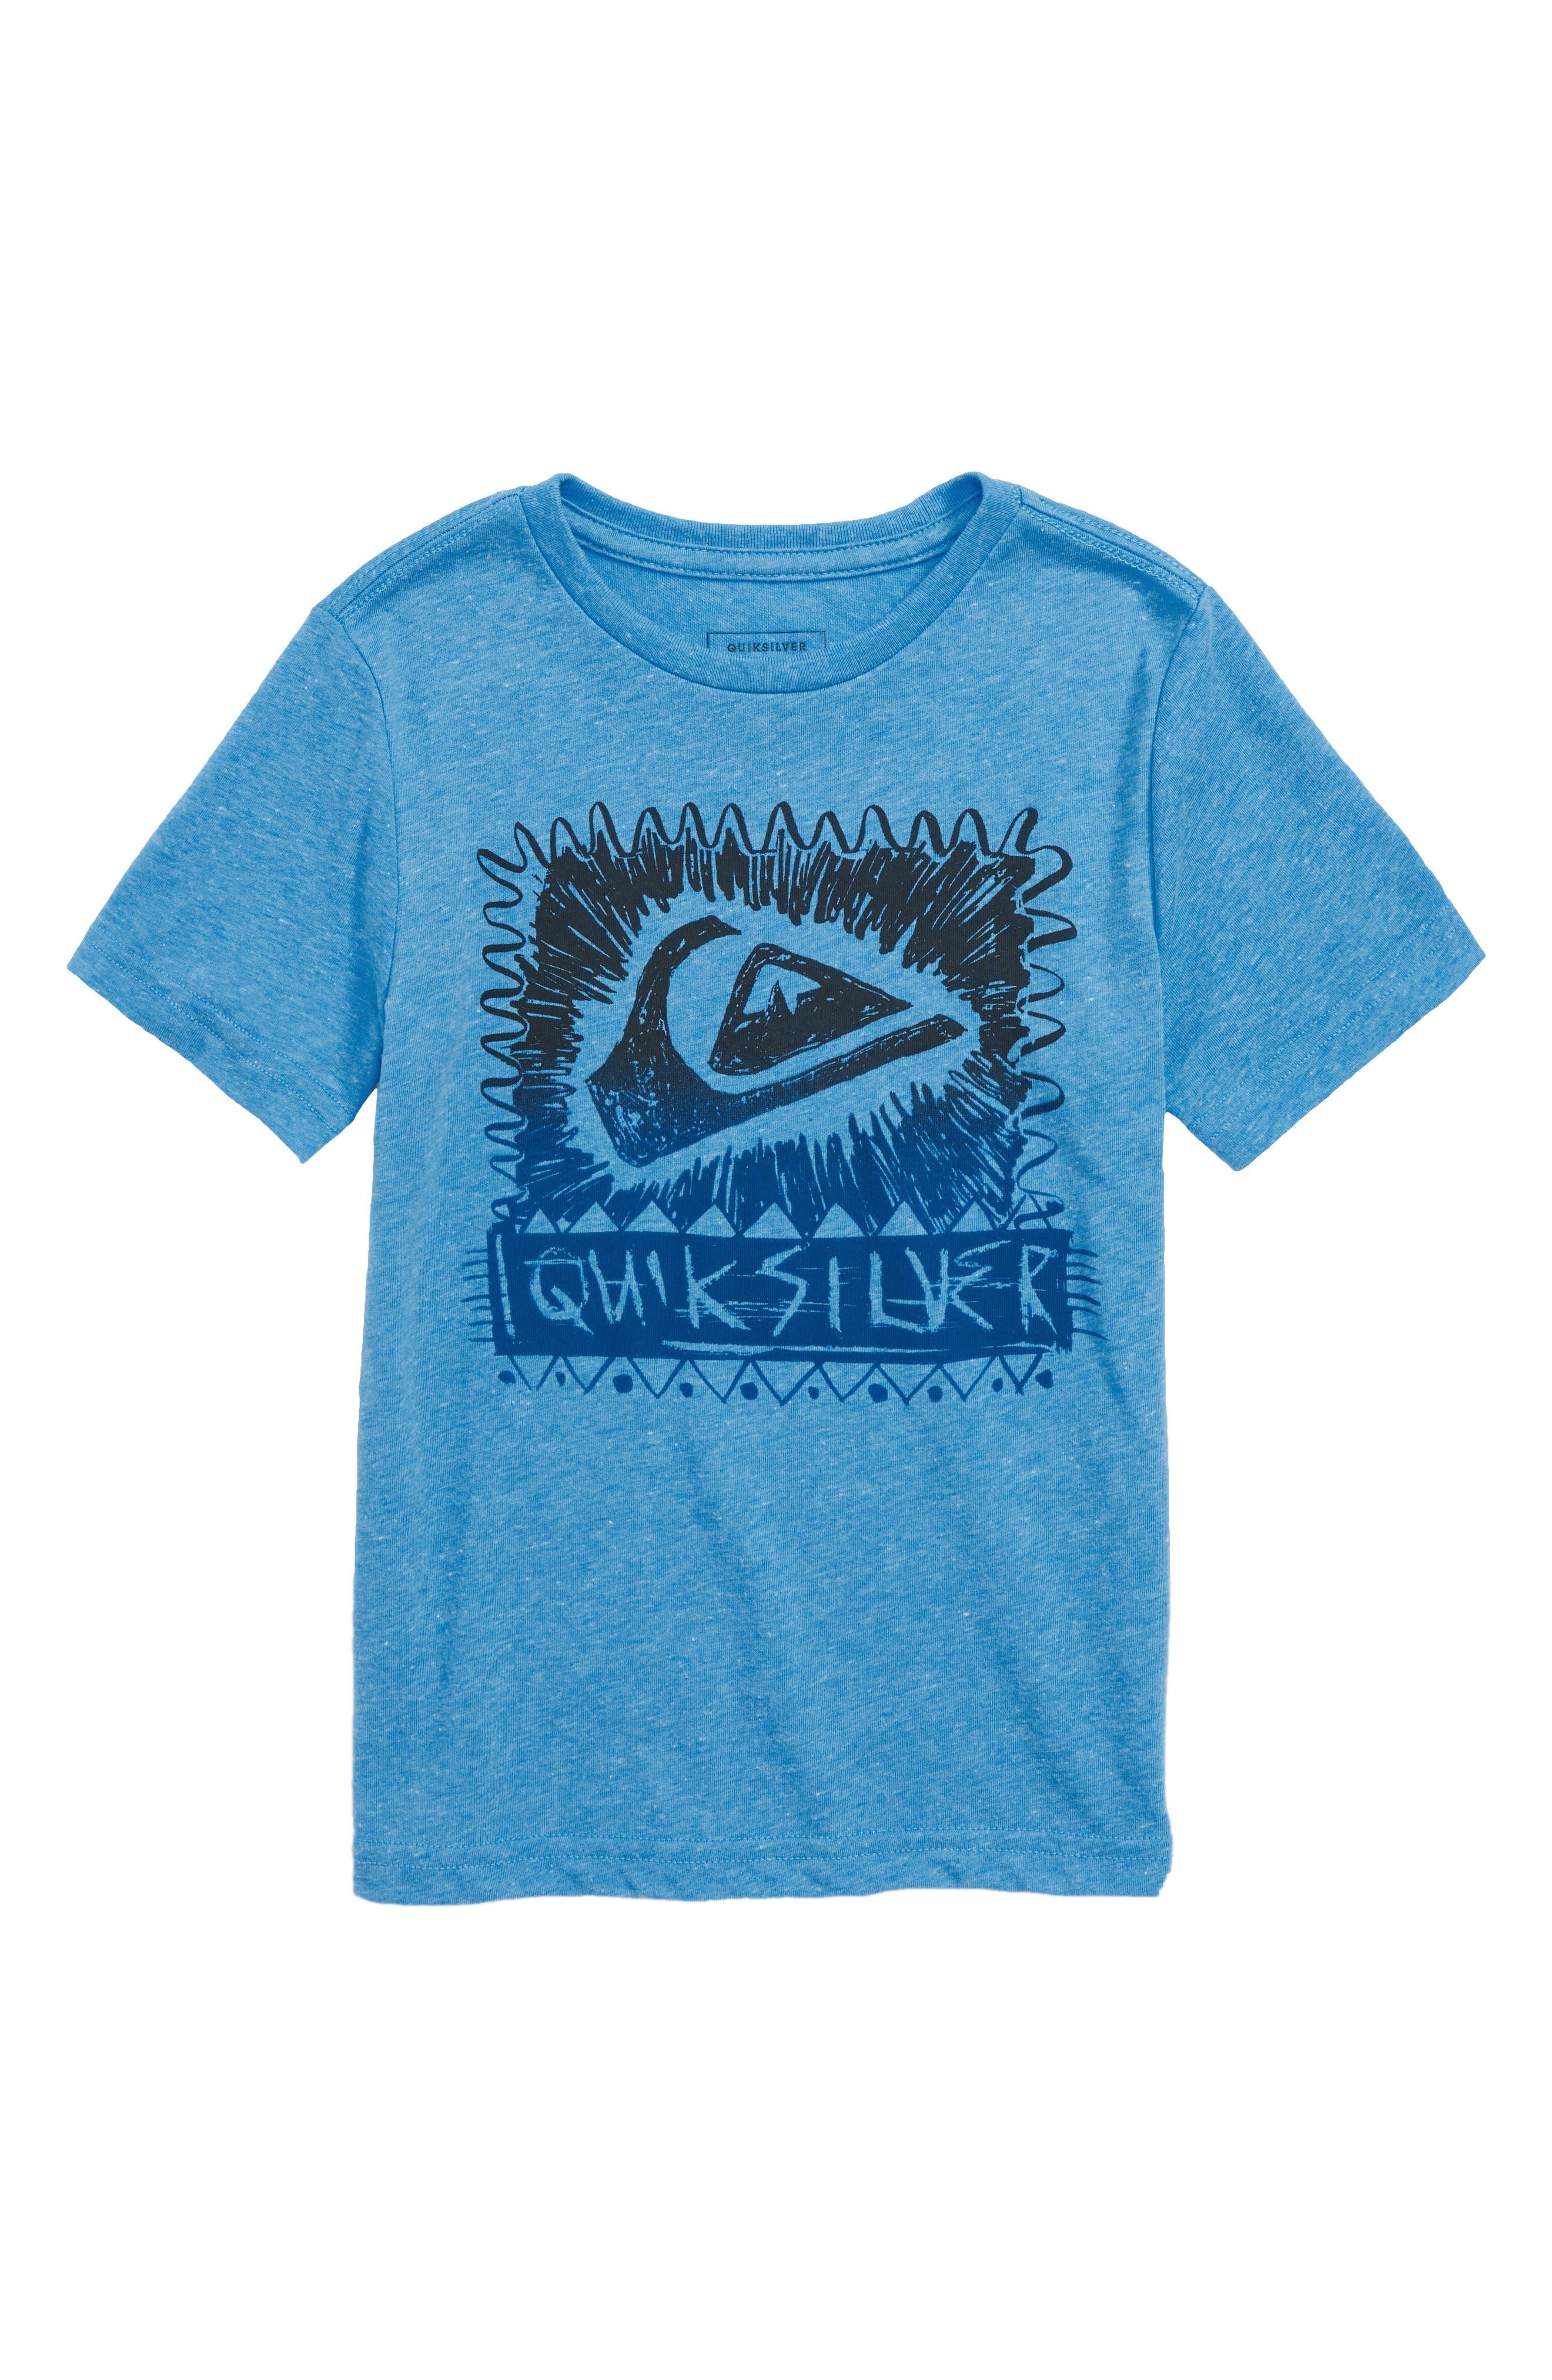 Quicksilver Laser Cut Graphic T-Shirt,                             Main thumbnail 1, color,                             Malibu Heather